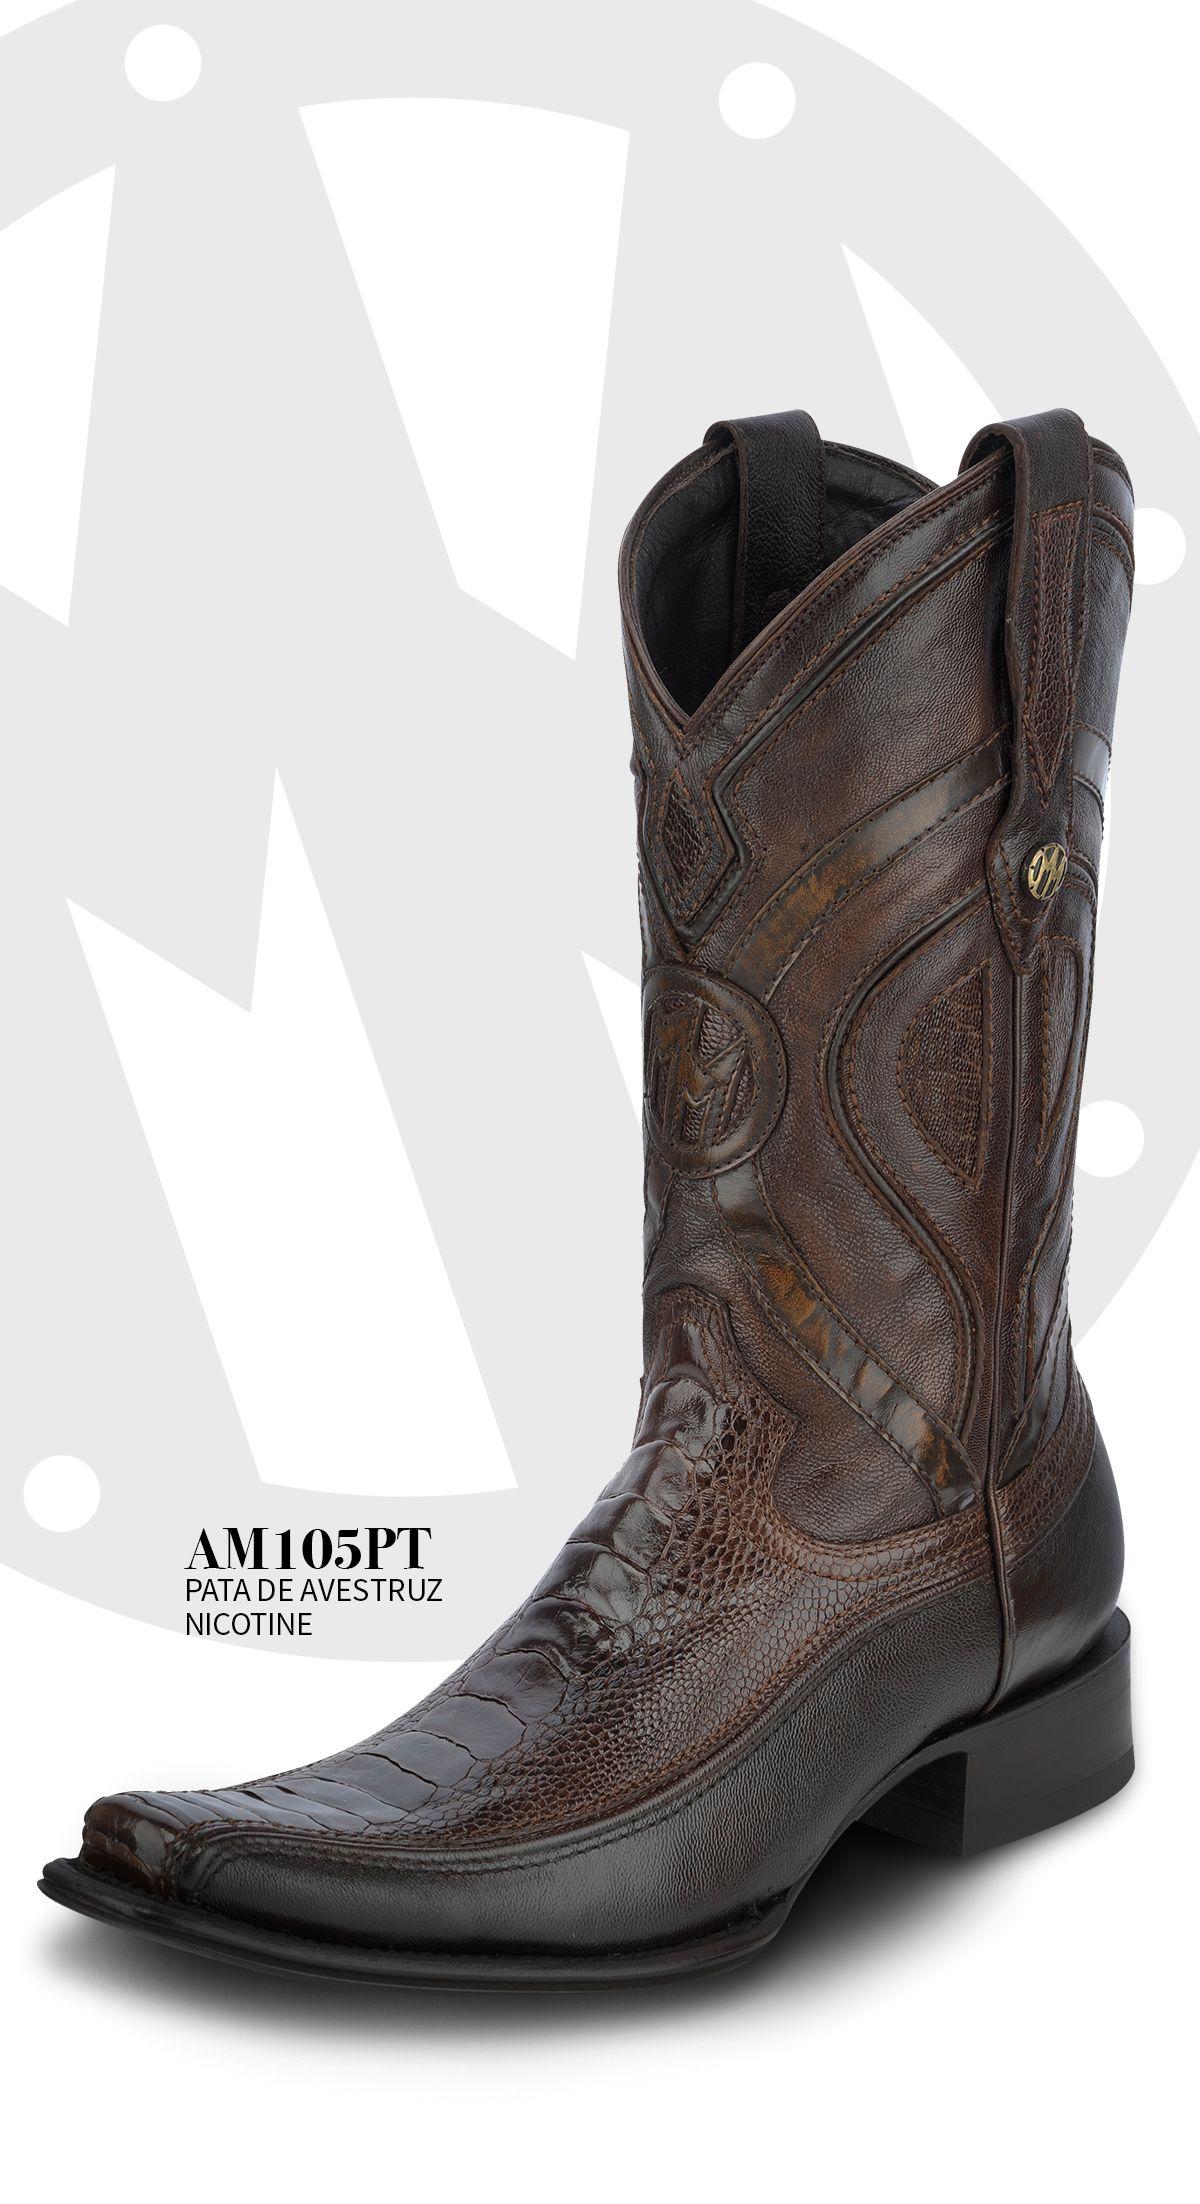 539a1fda60 Botas vaqueras.  Boots  rodeo  vaqueros  westernstyle  botasdehombre   botasvaqueras  botasdepiel  botasdepielexótica